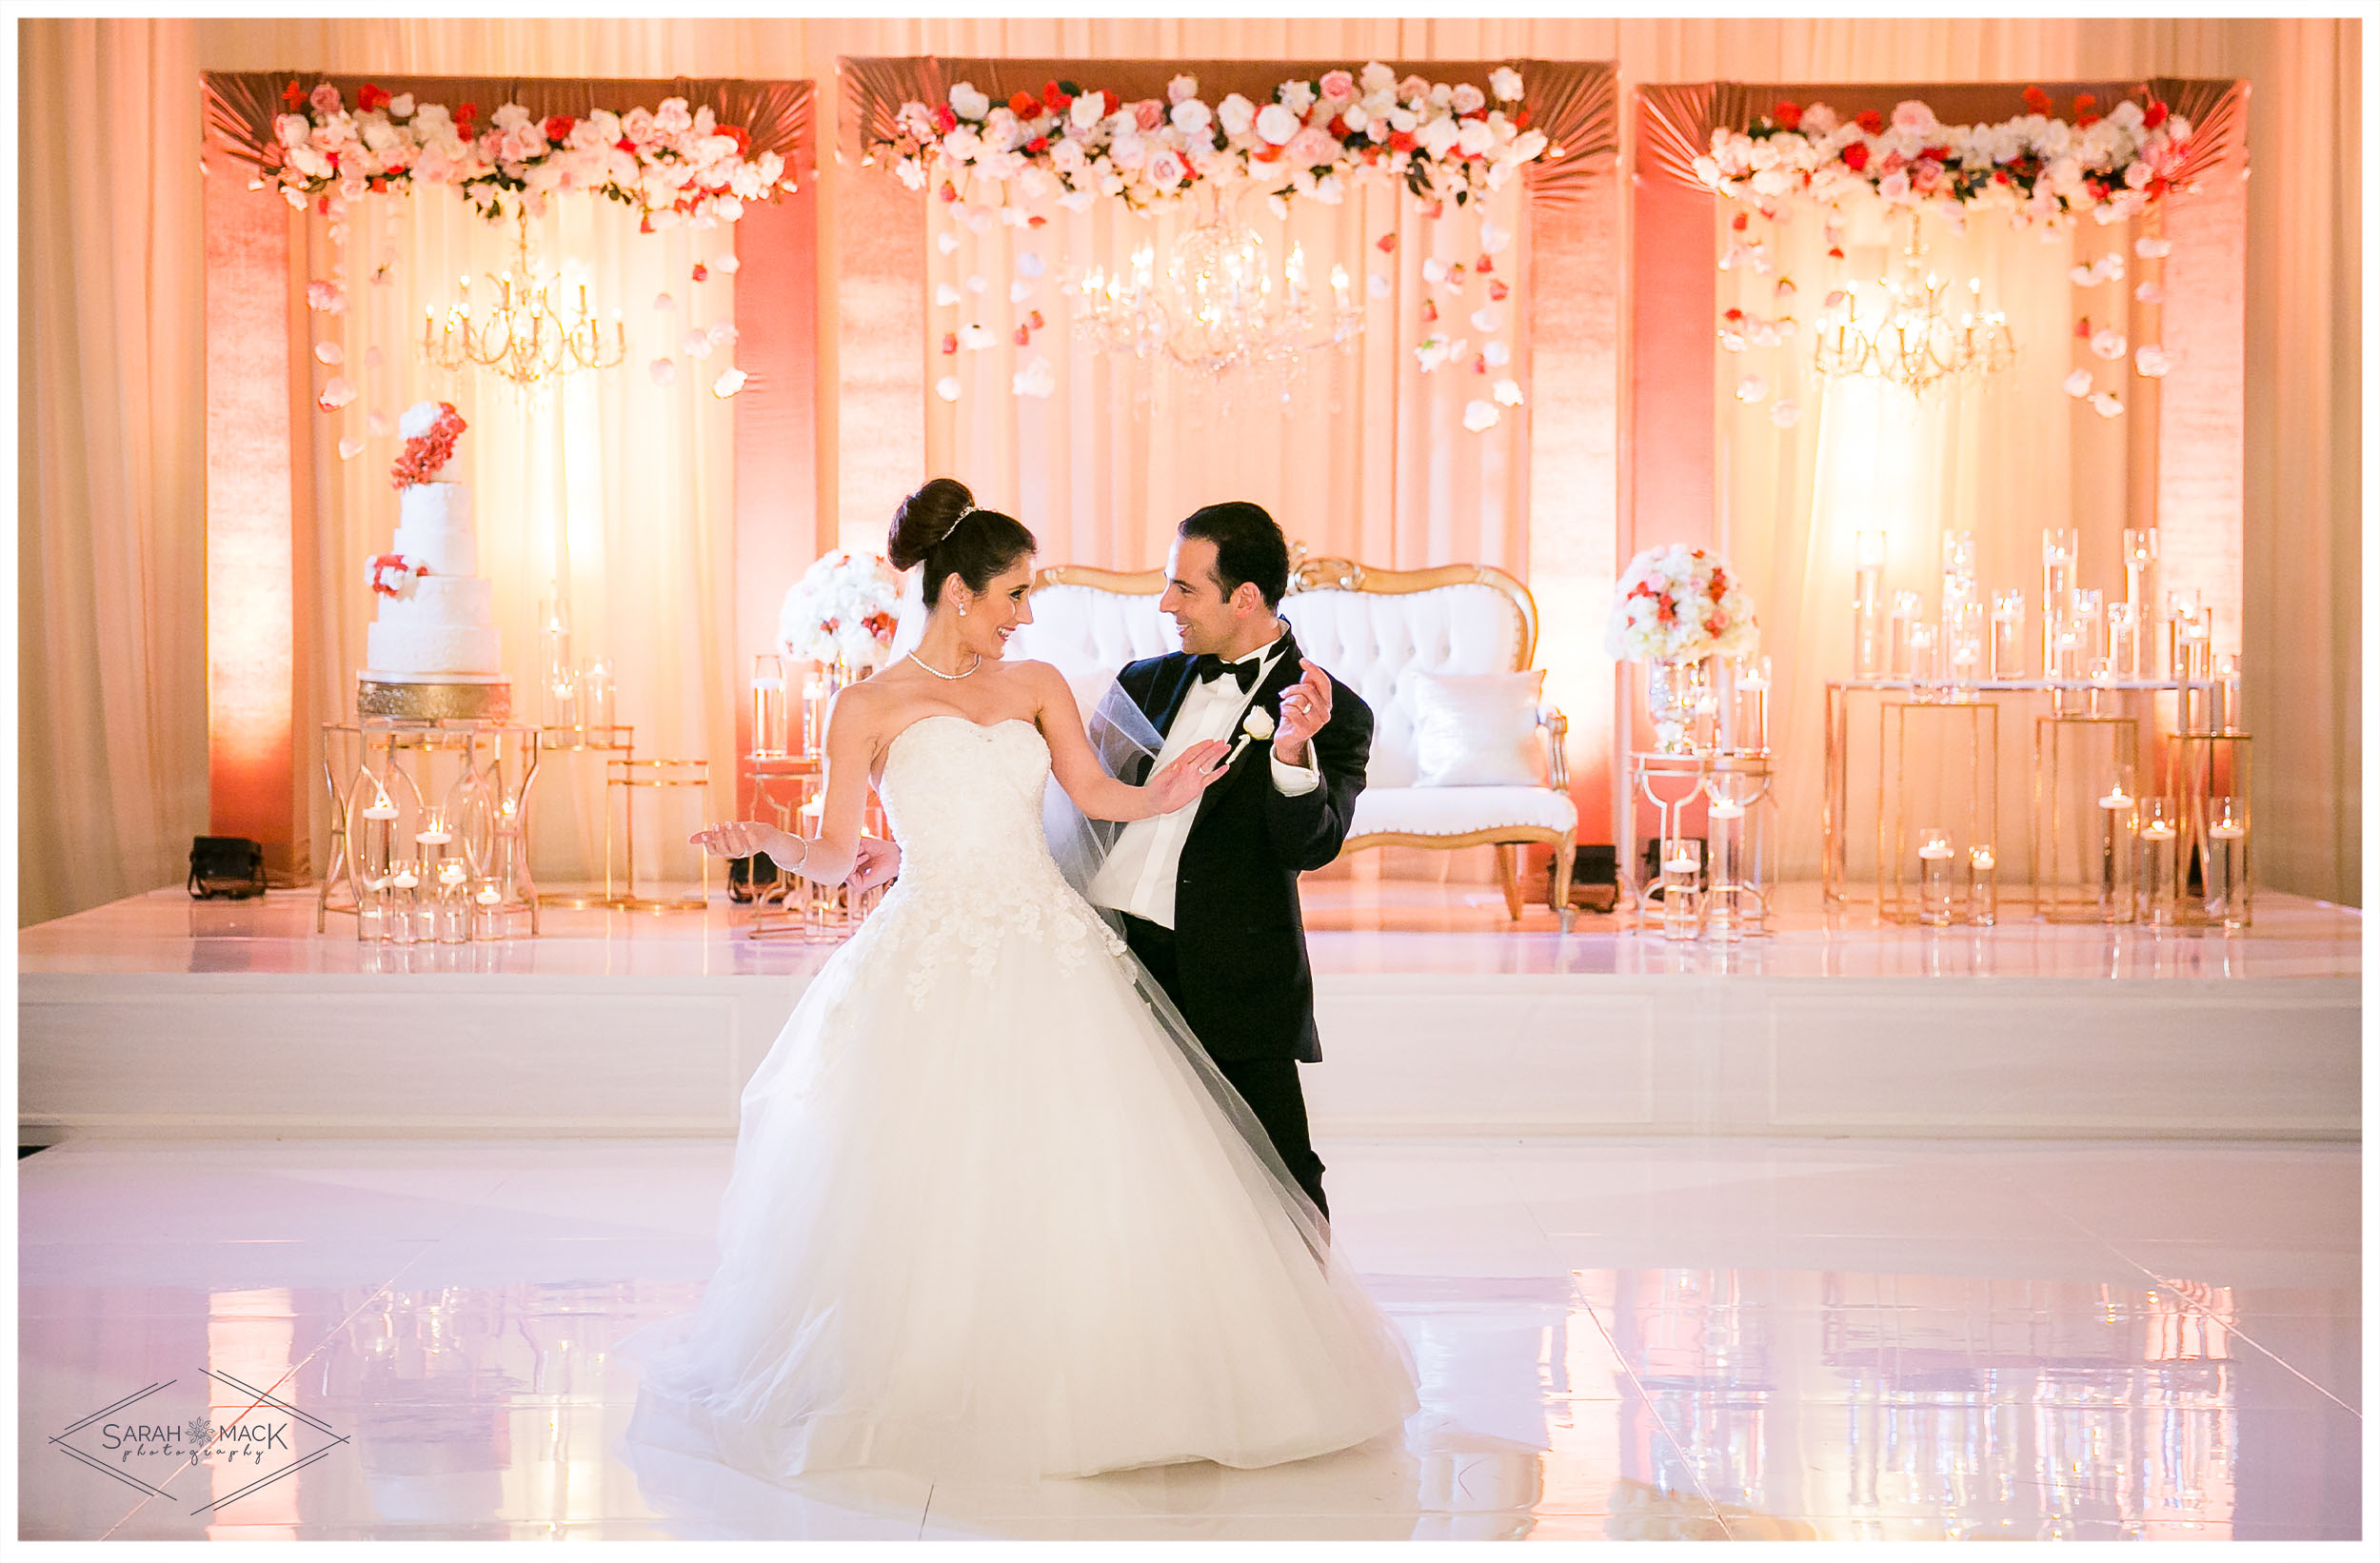 NJ-Newport-Beach-Marriott-Persian-Wedding-39.jpg